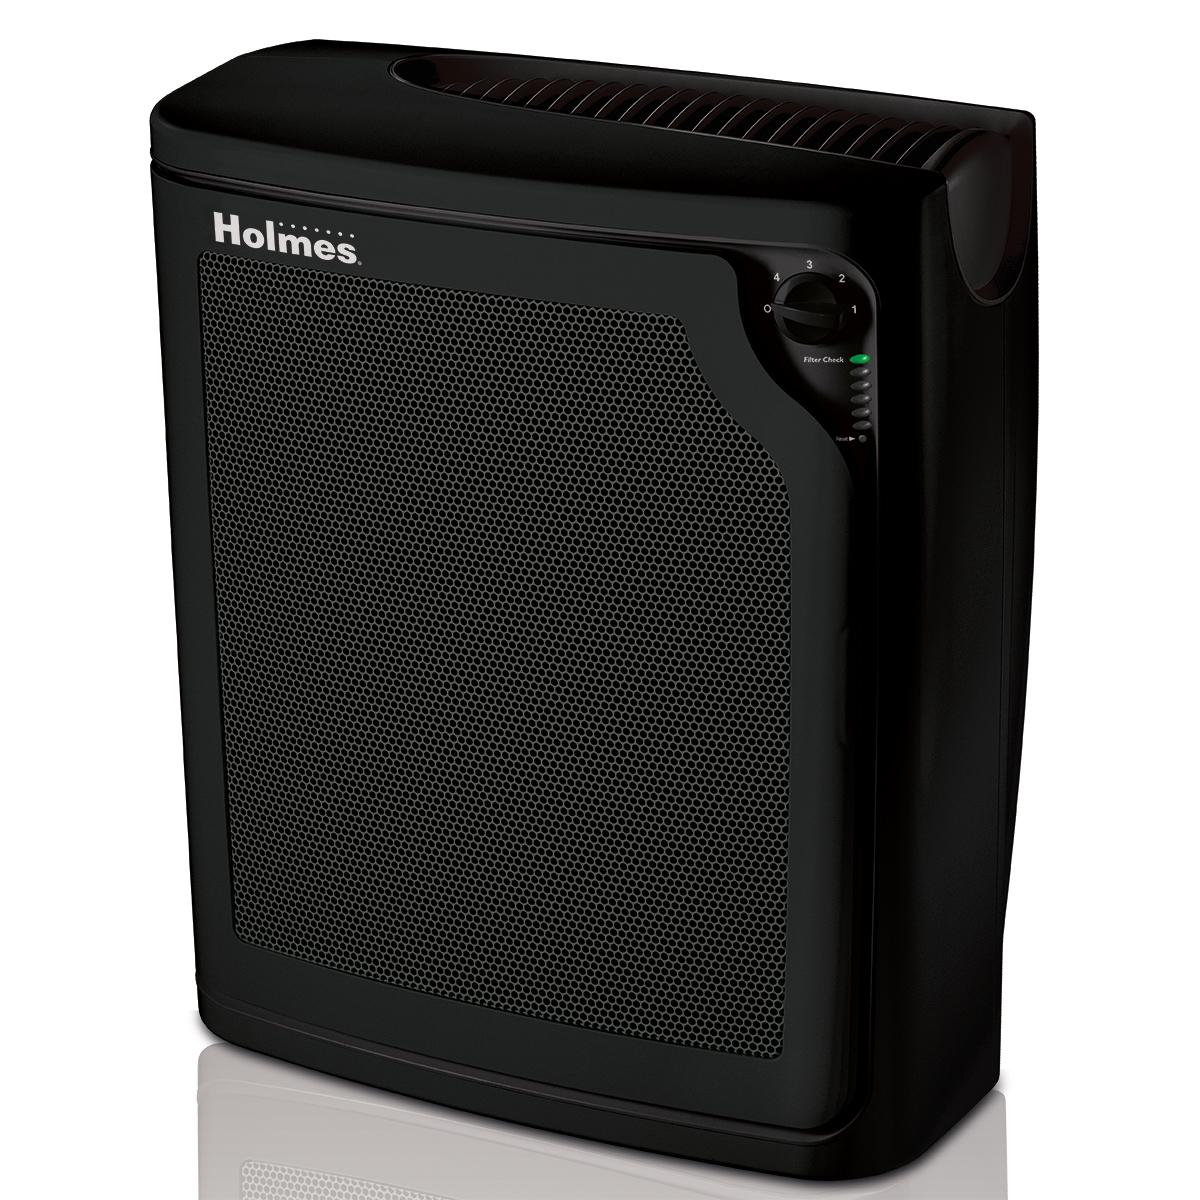 Holmes Allergen HEPA Large Console, Black (HAP8650B-NU)